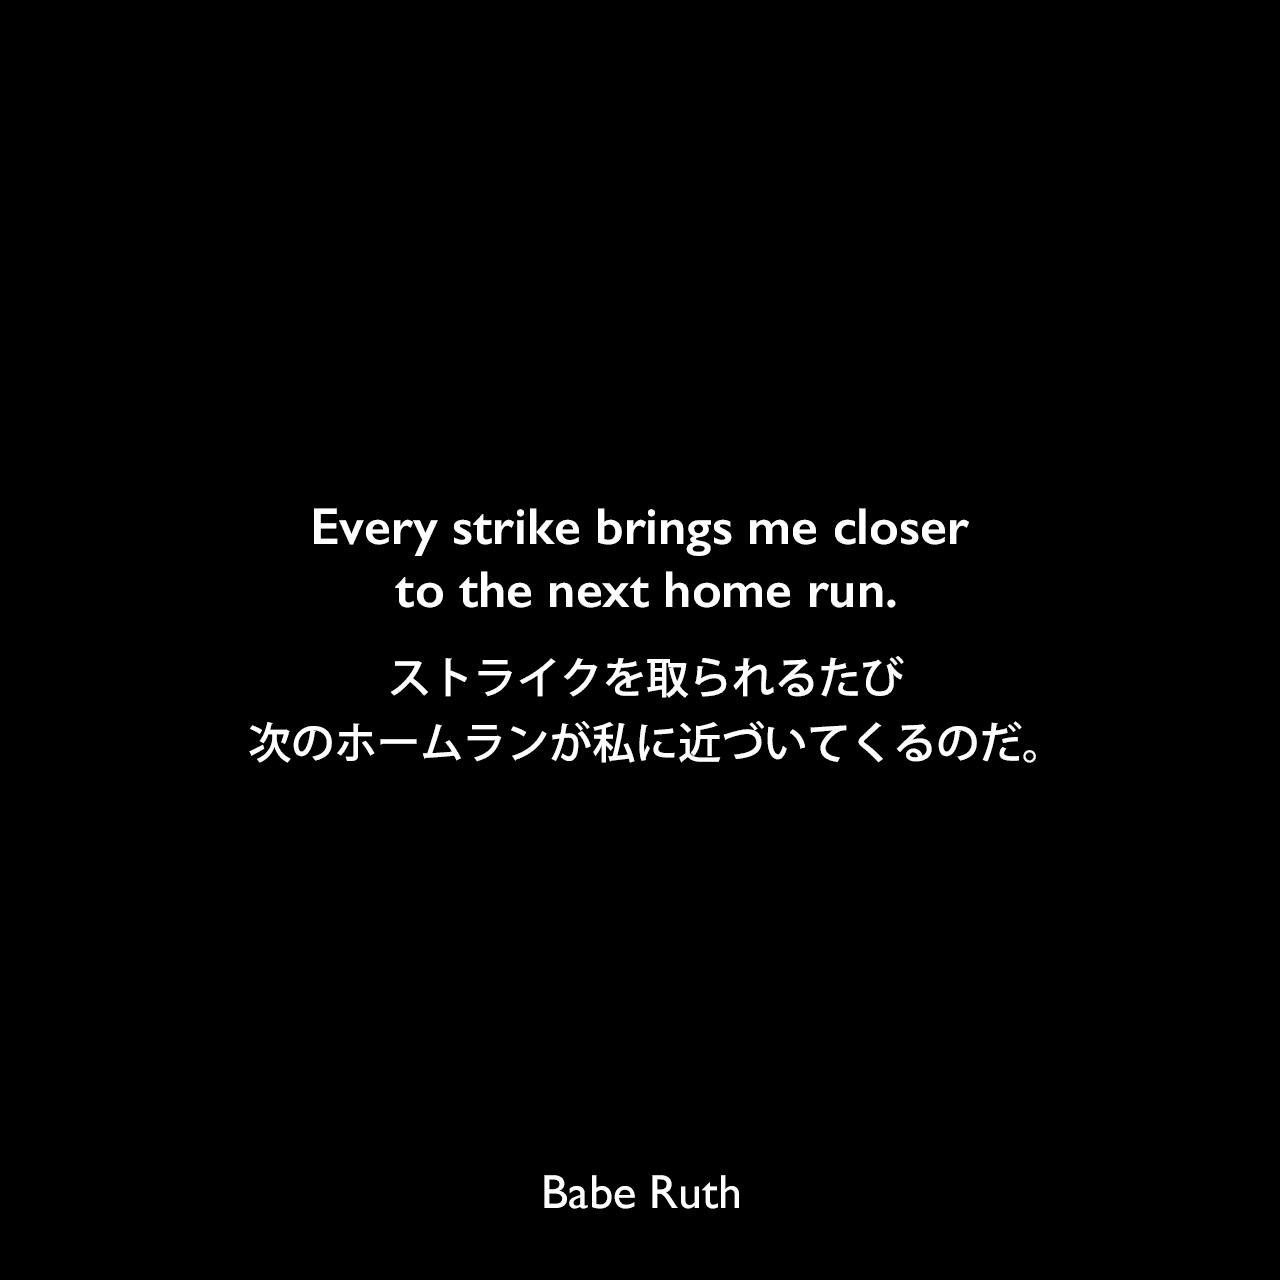 Every strike brings me closer to the next home run.ストライクを取られるたび、次のホームランが私に近づいてくるのだ。Babe Ruth